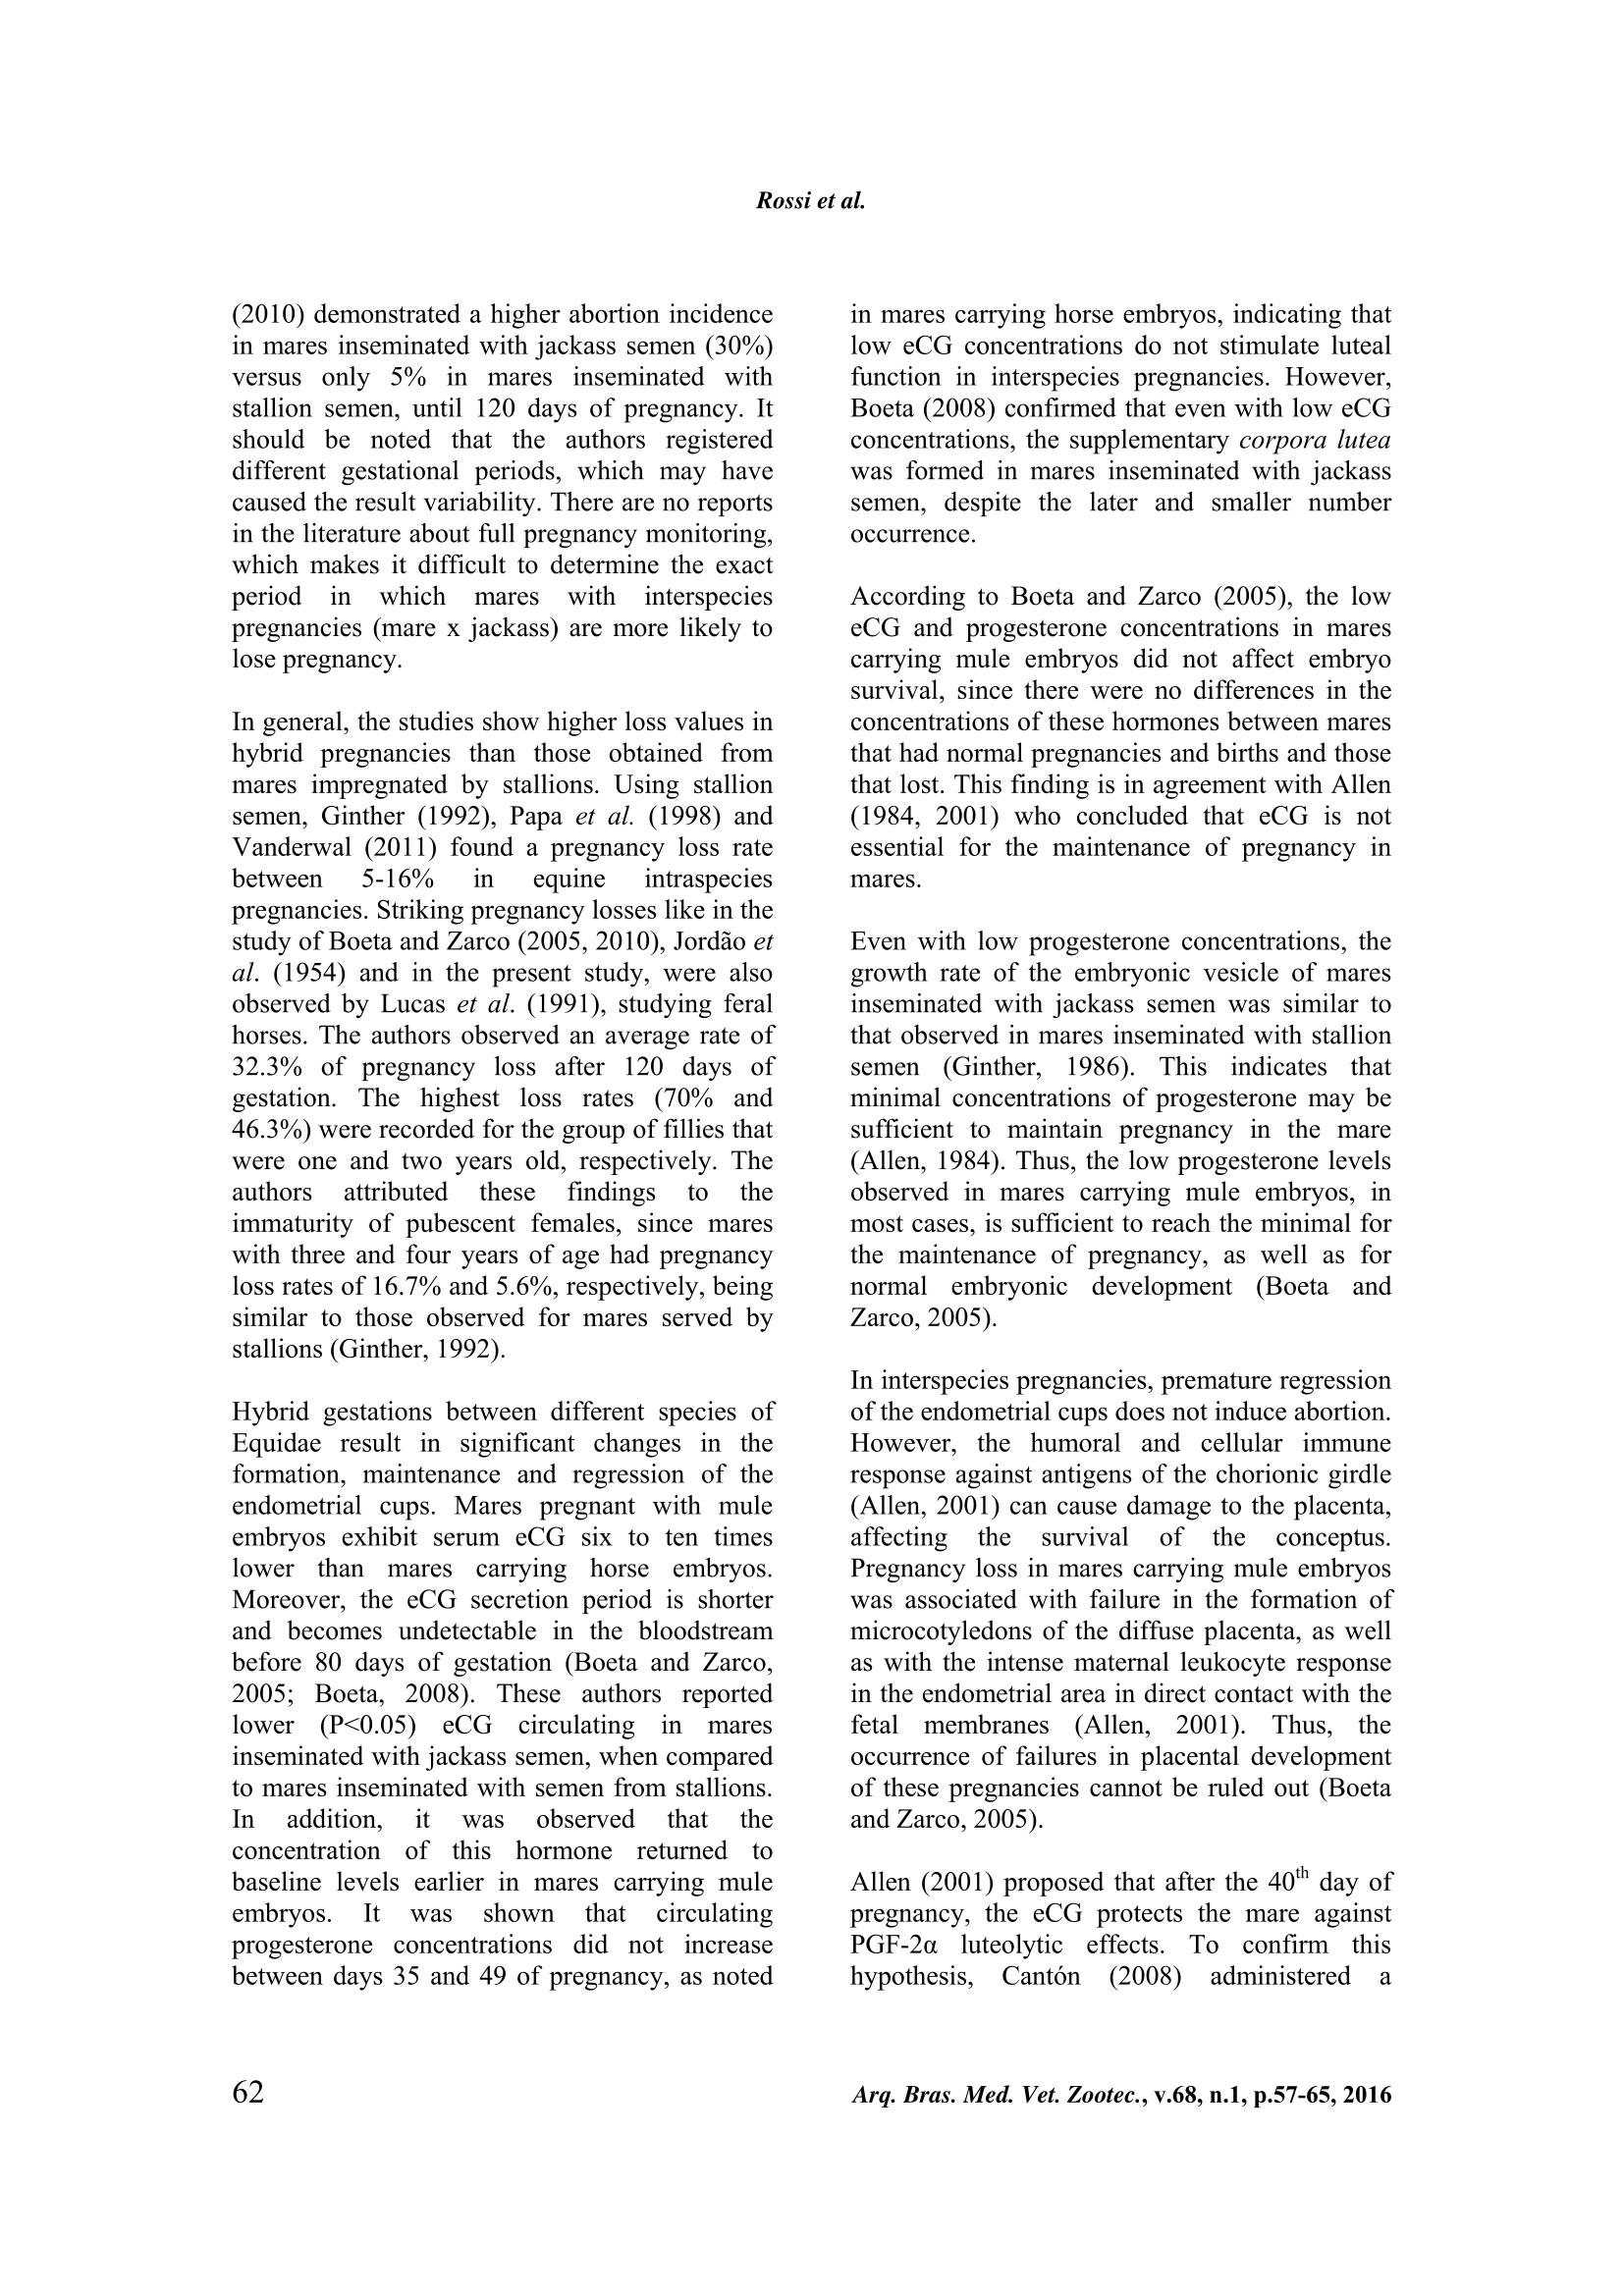 AMA 3-6 (1).png